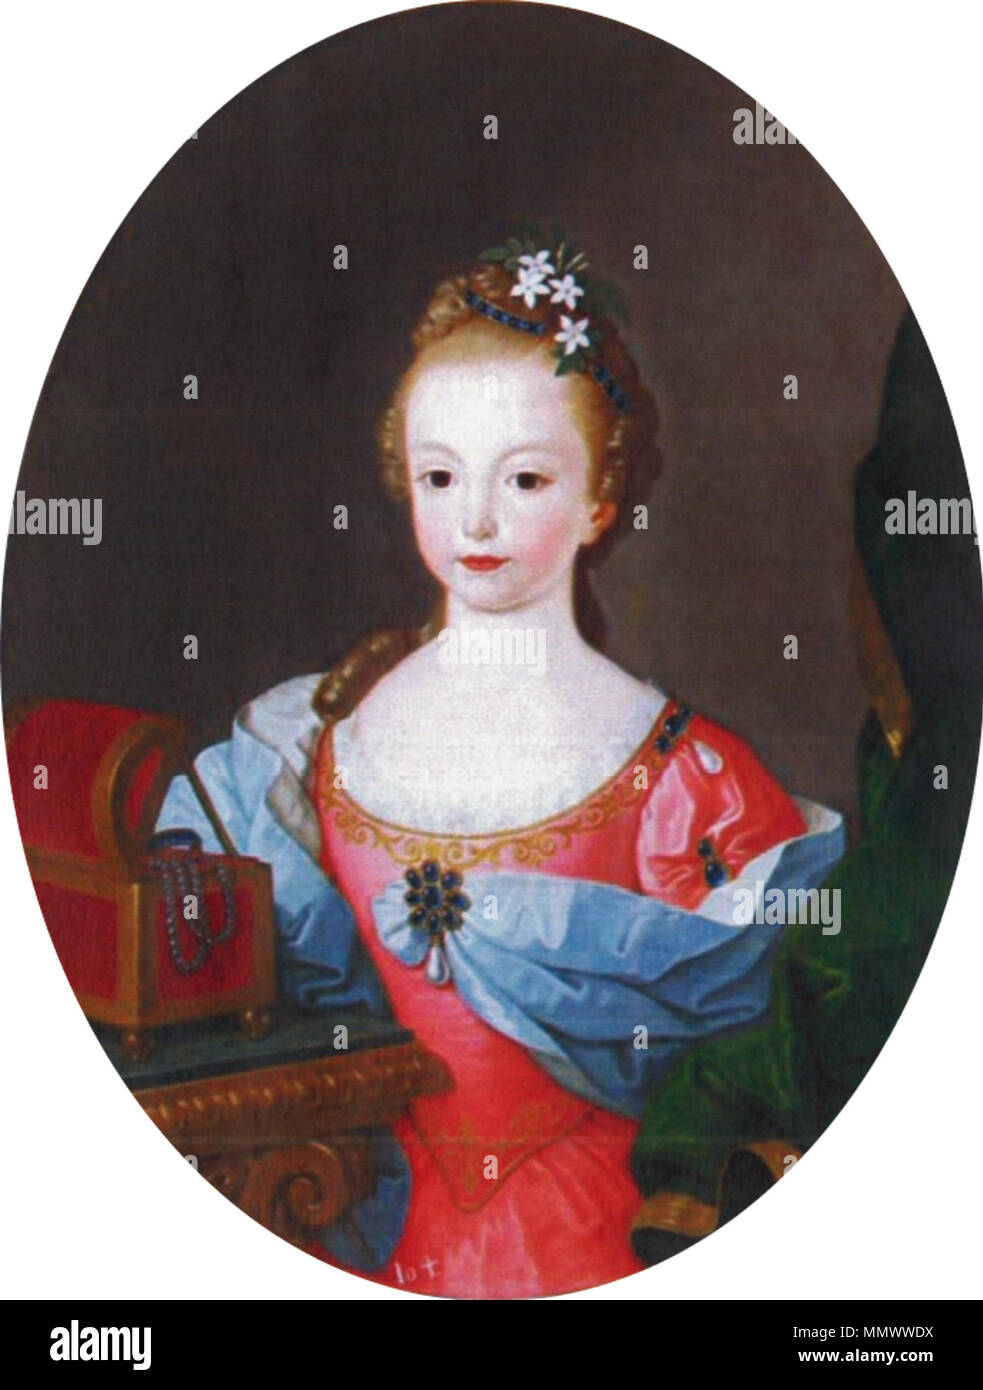 D. Maria Benedita de Bragança (1753) - Francisco Vieira Lusitano - Stock Image